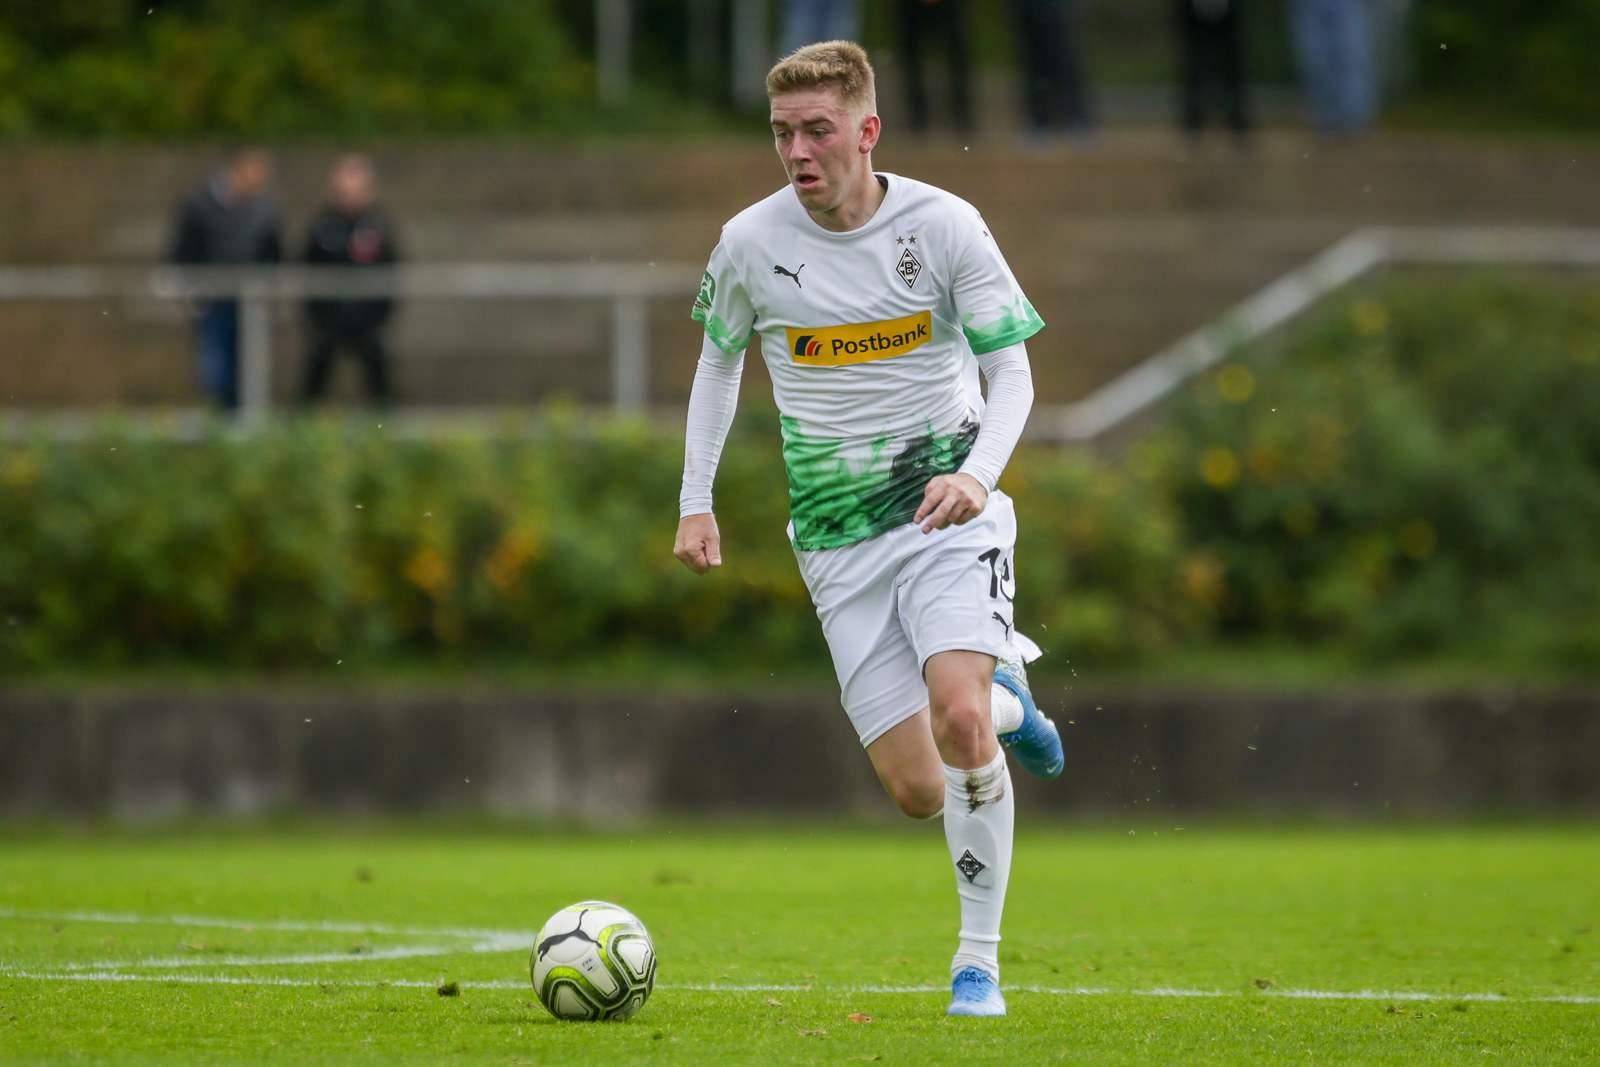 Andreas Poulsen von Borussia Mönchengladbach